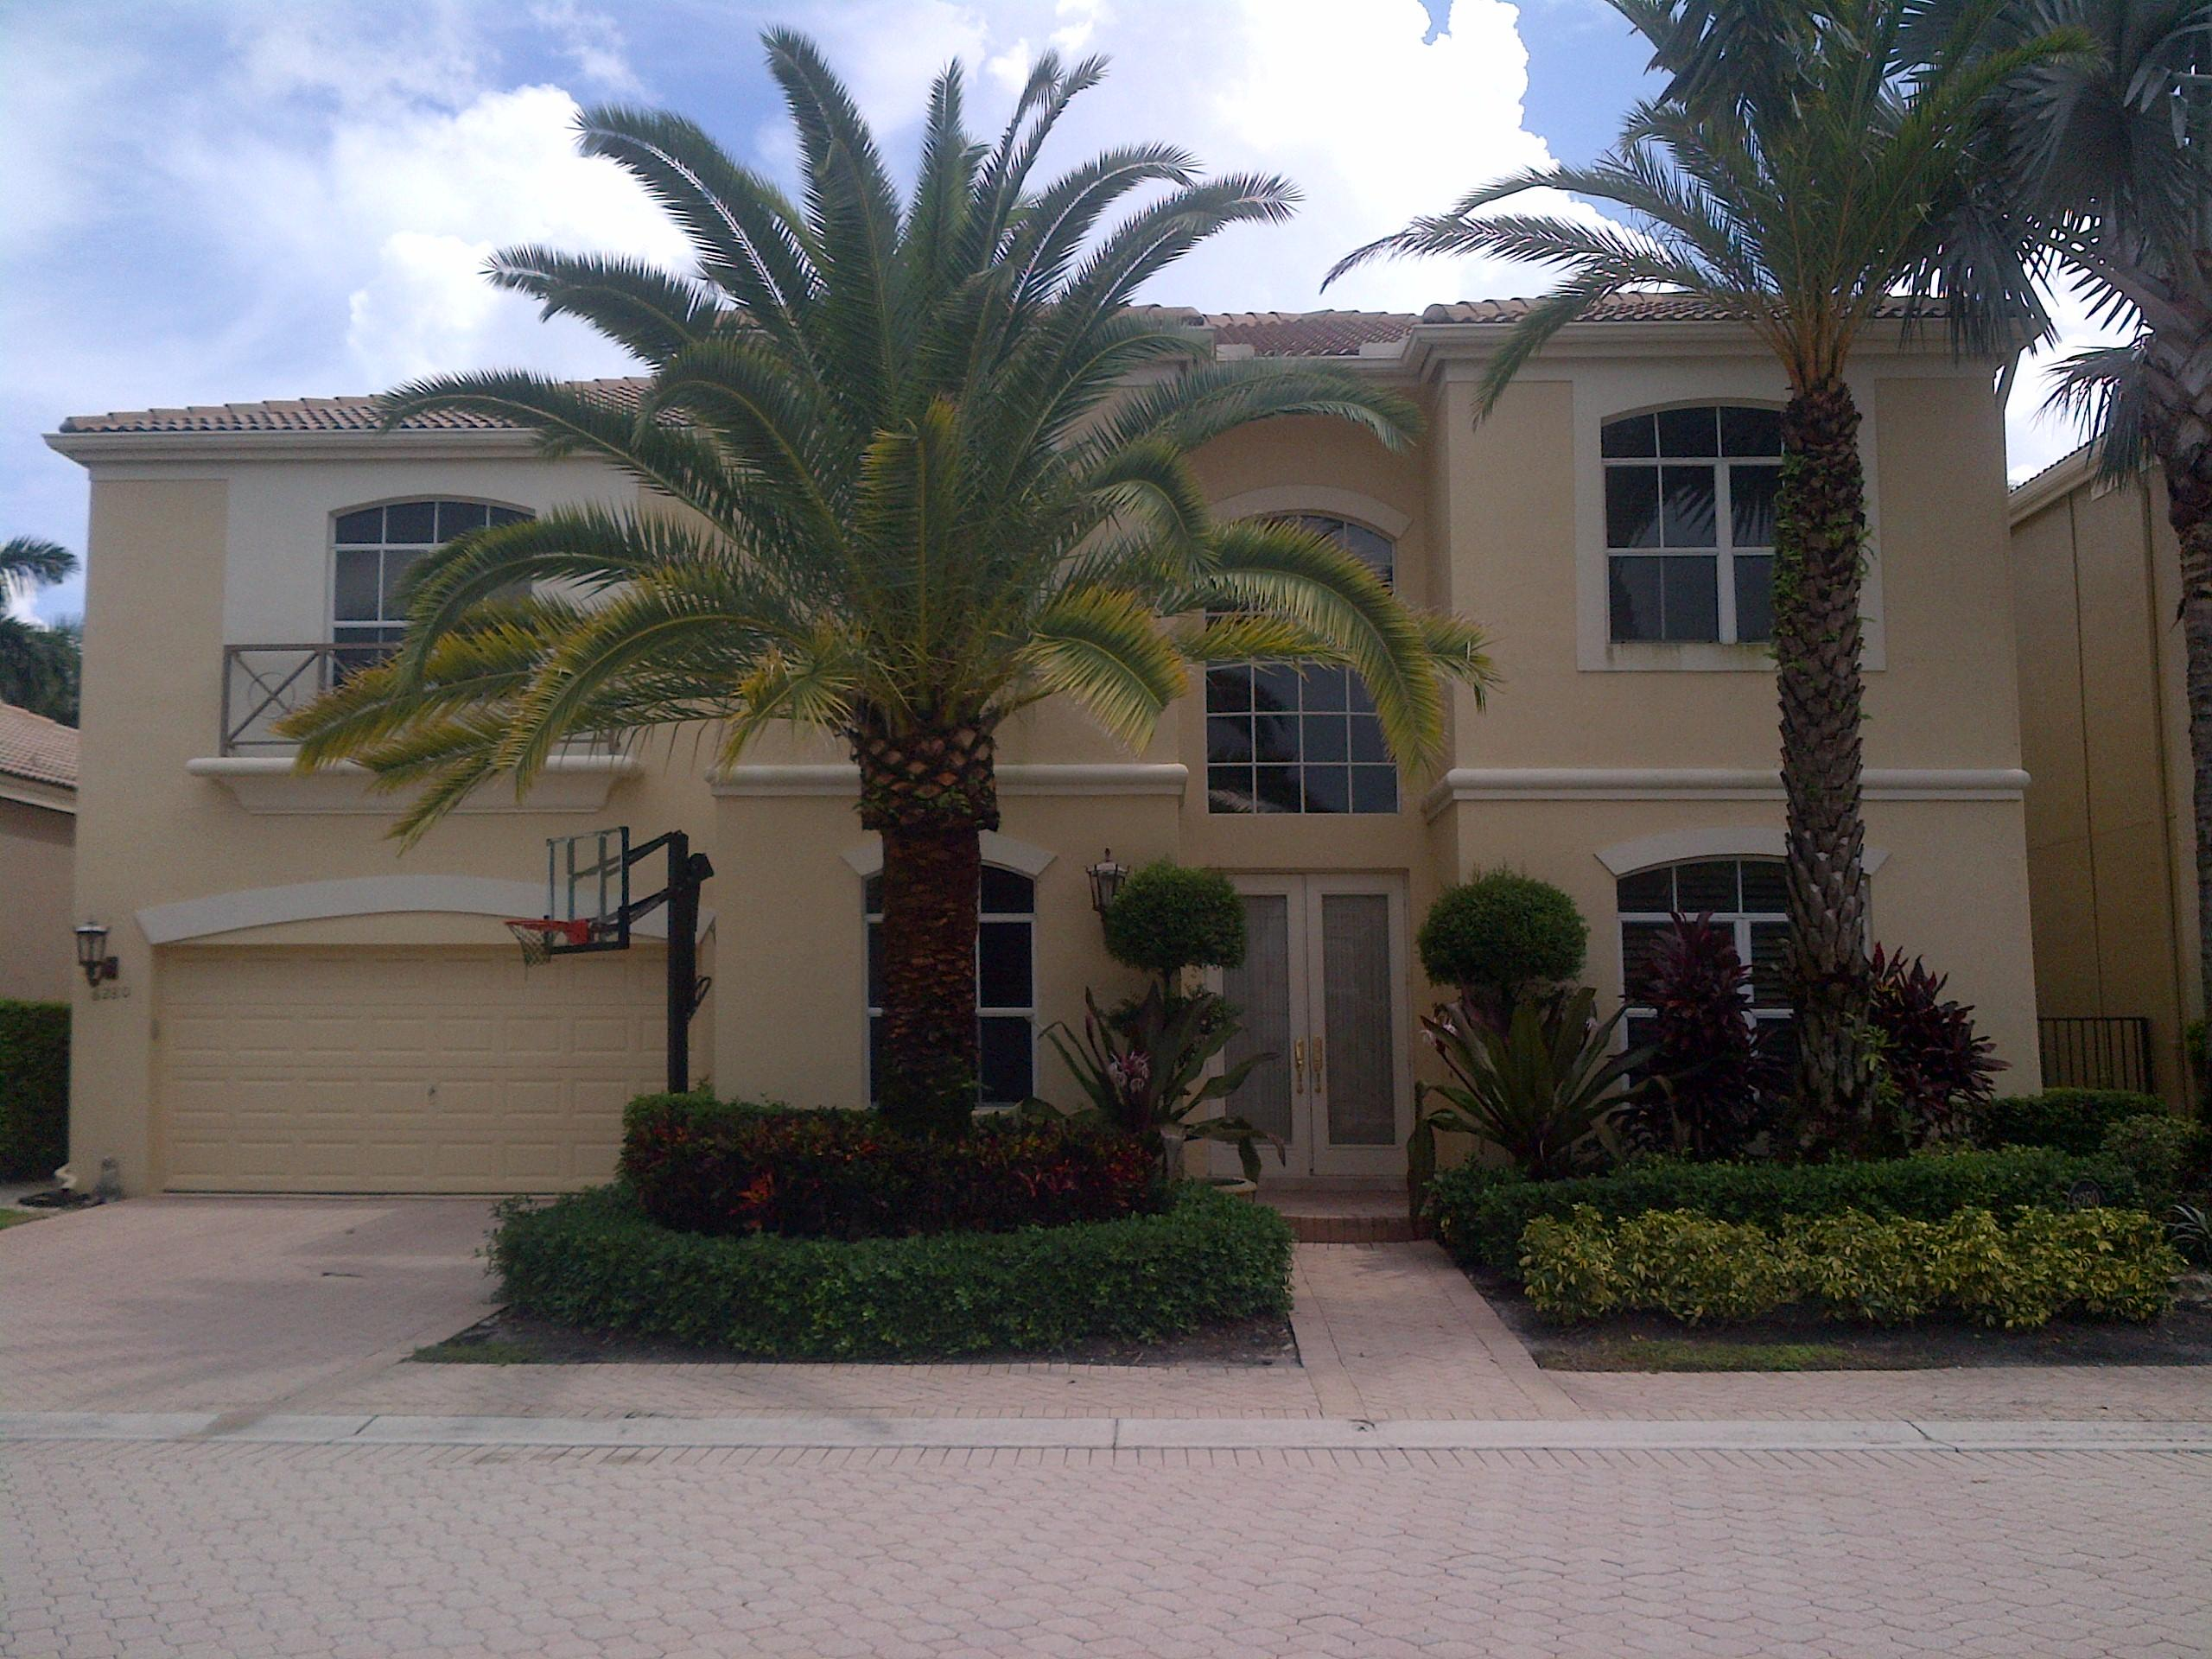 6280 Nw 42nd Way Boca Raton, FL 33496